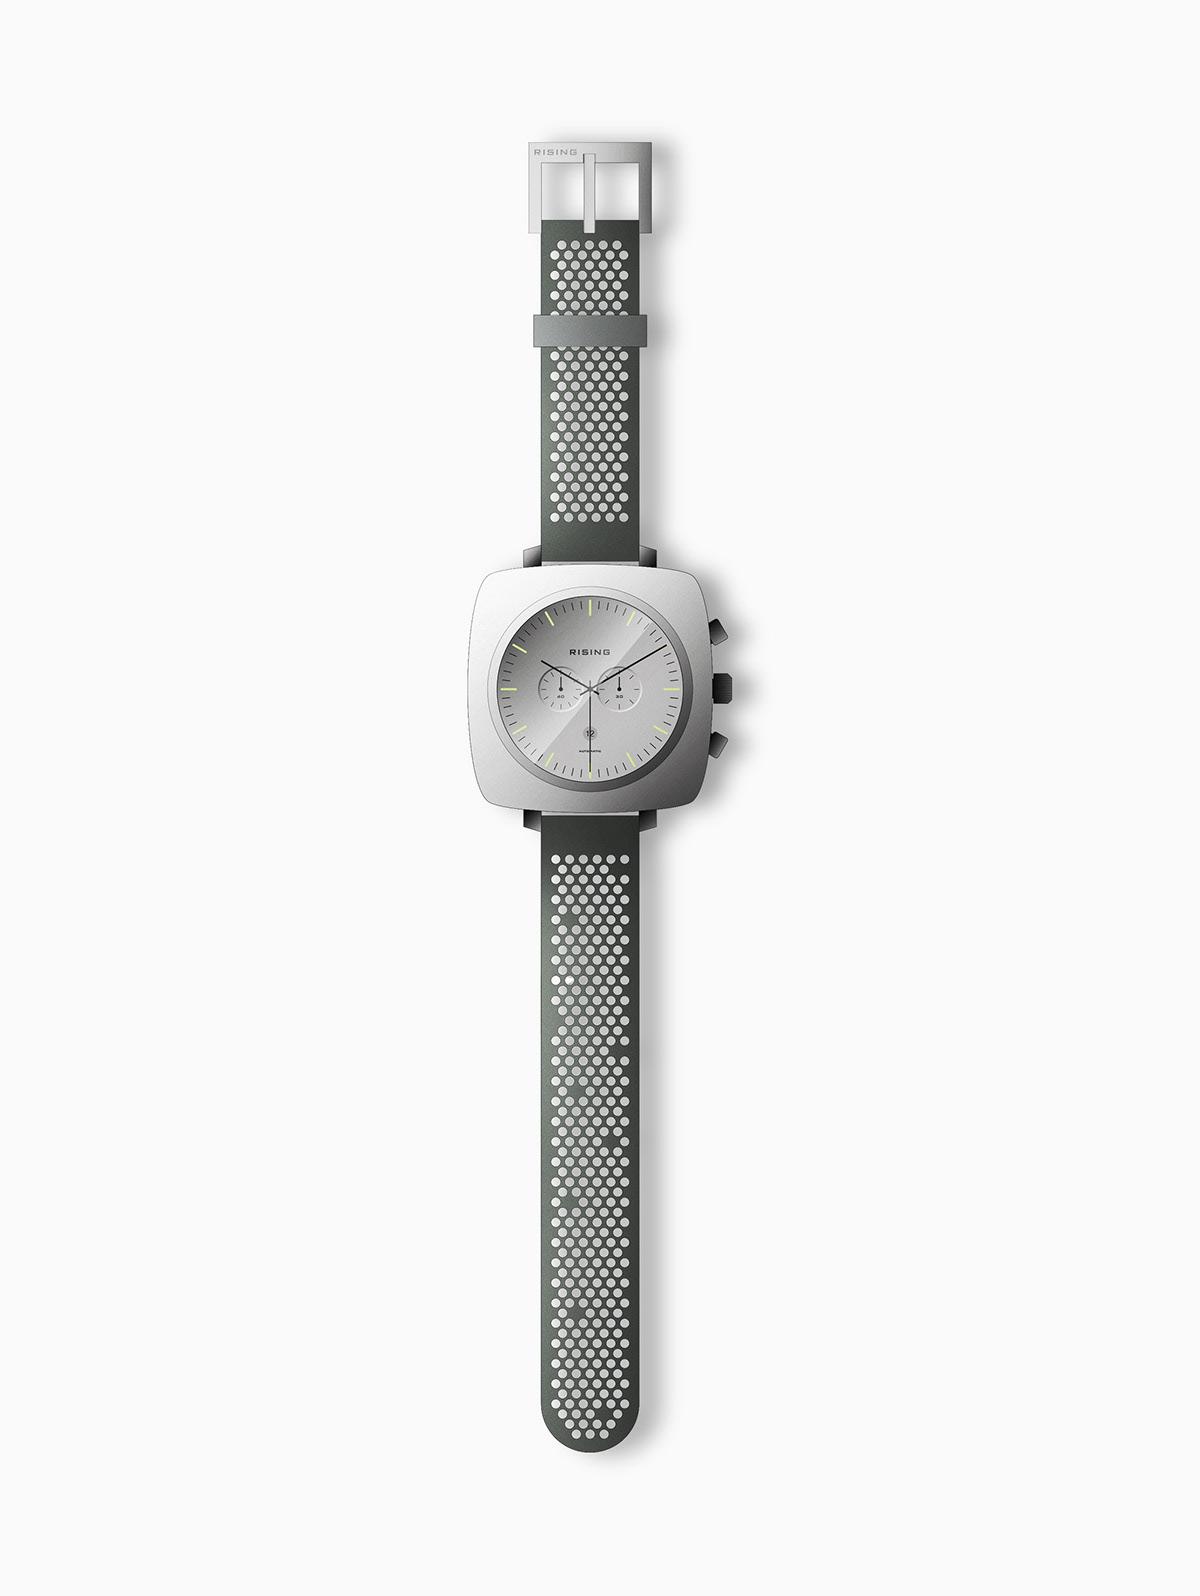 Brand Design industrial design  product design  rising chronograph sebastian halin watch design swedish design art direction  graphic design